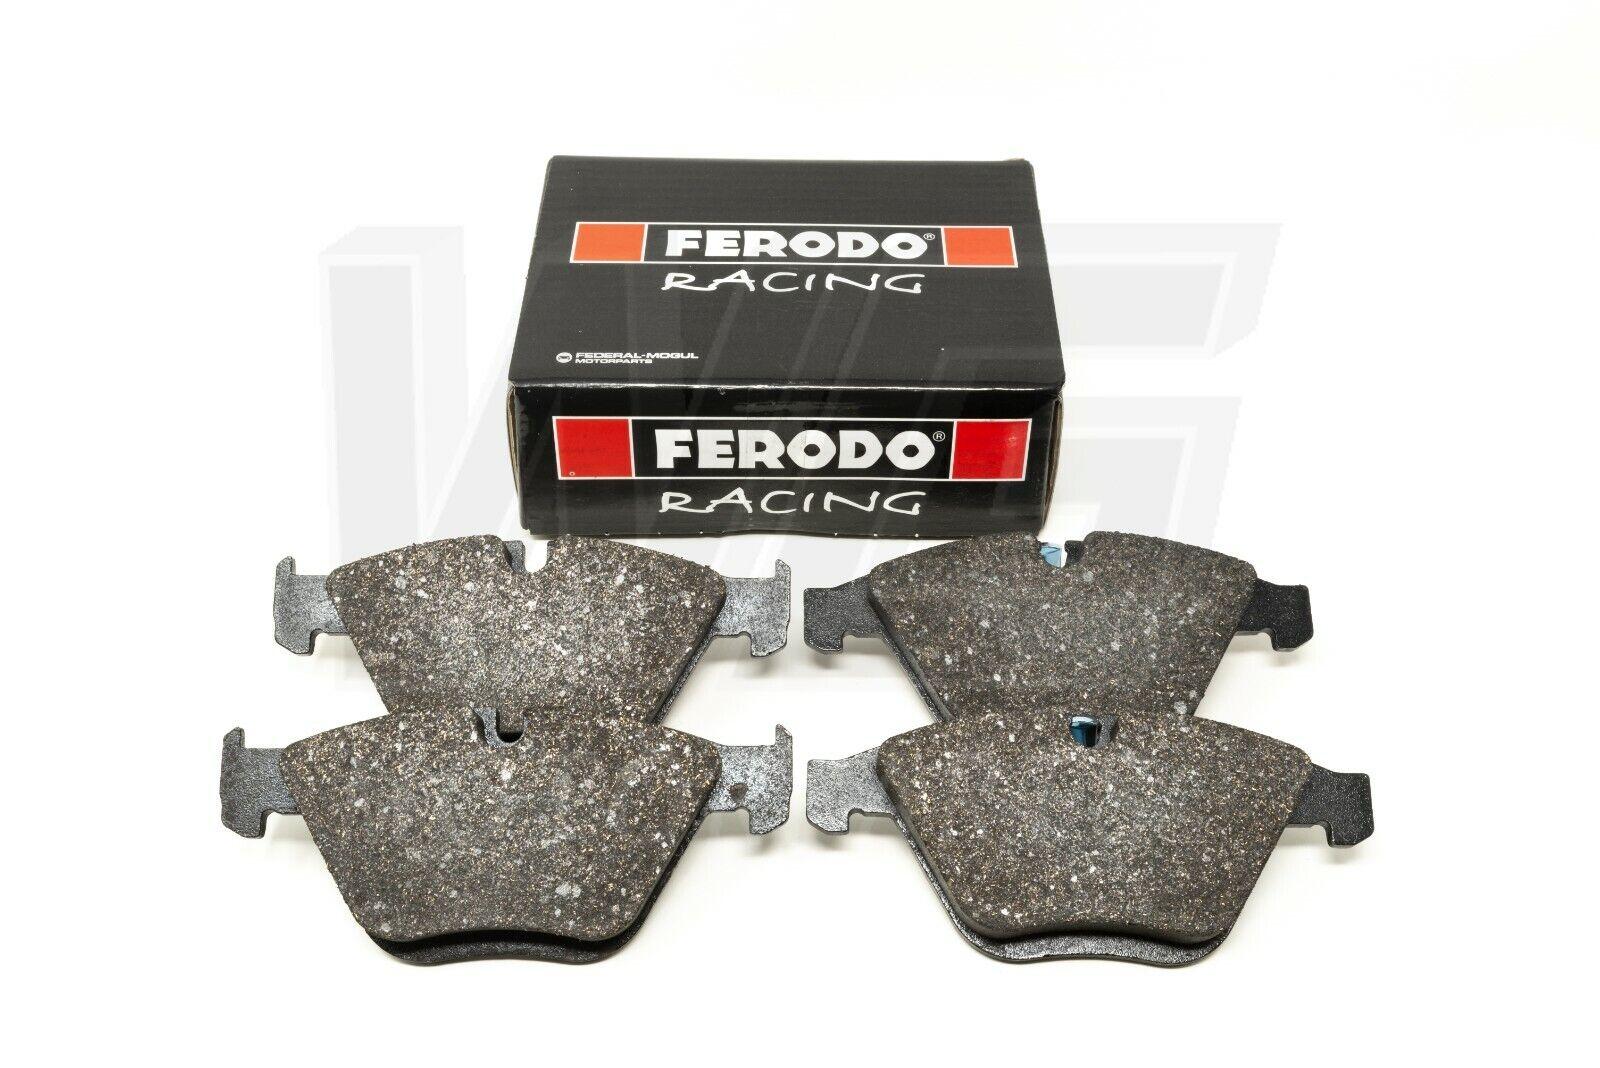 PN Ferodo DS2500 Front Pads for Vauxhall Astra H VXR MK5 2.0T Z20LEH FCP1520H